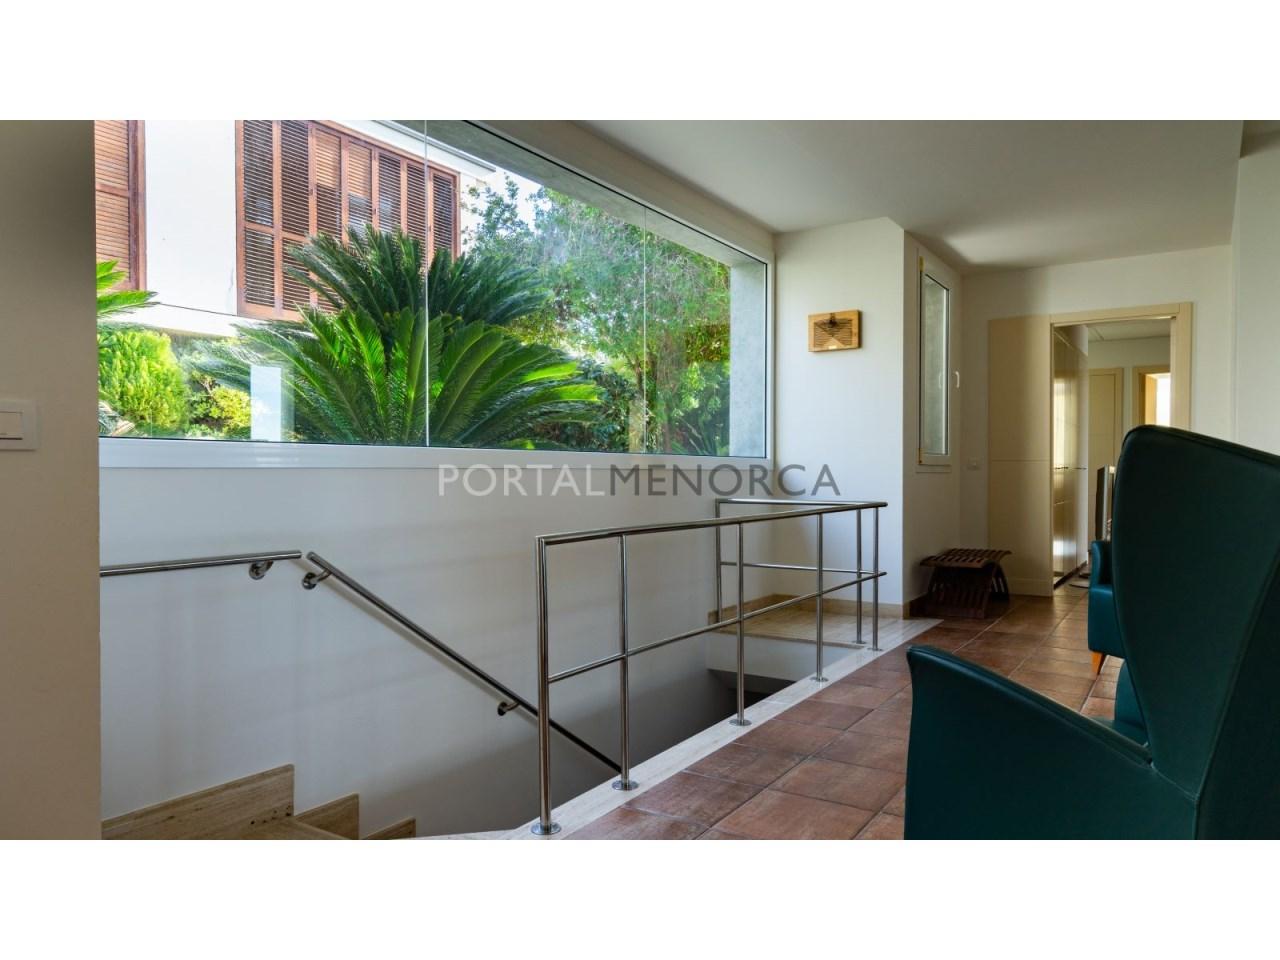 acheter-maison-port-mahon-menorca-minorque (5)